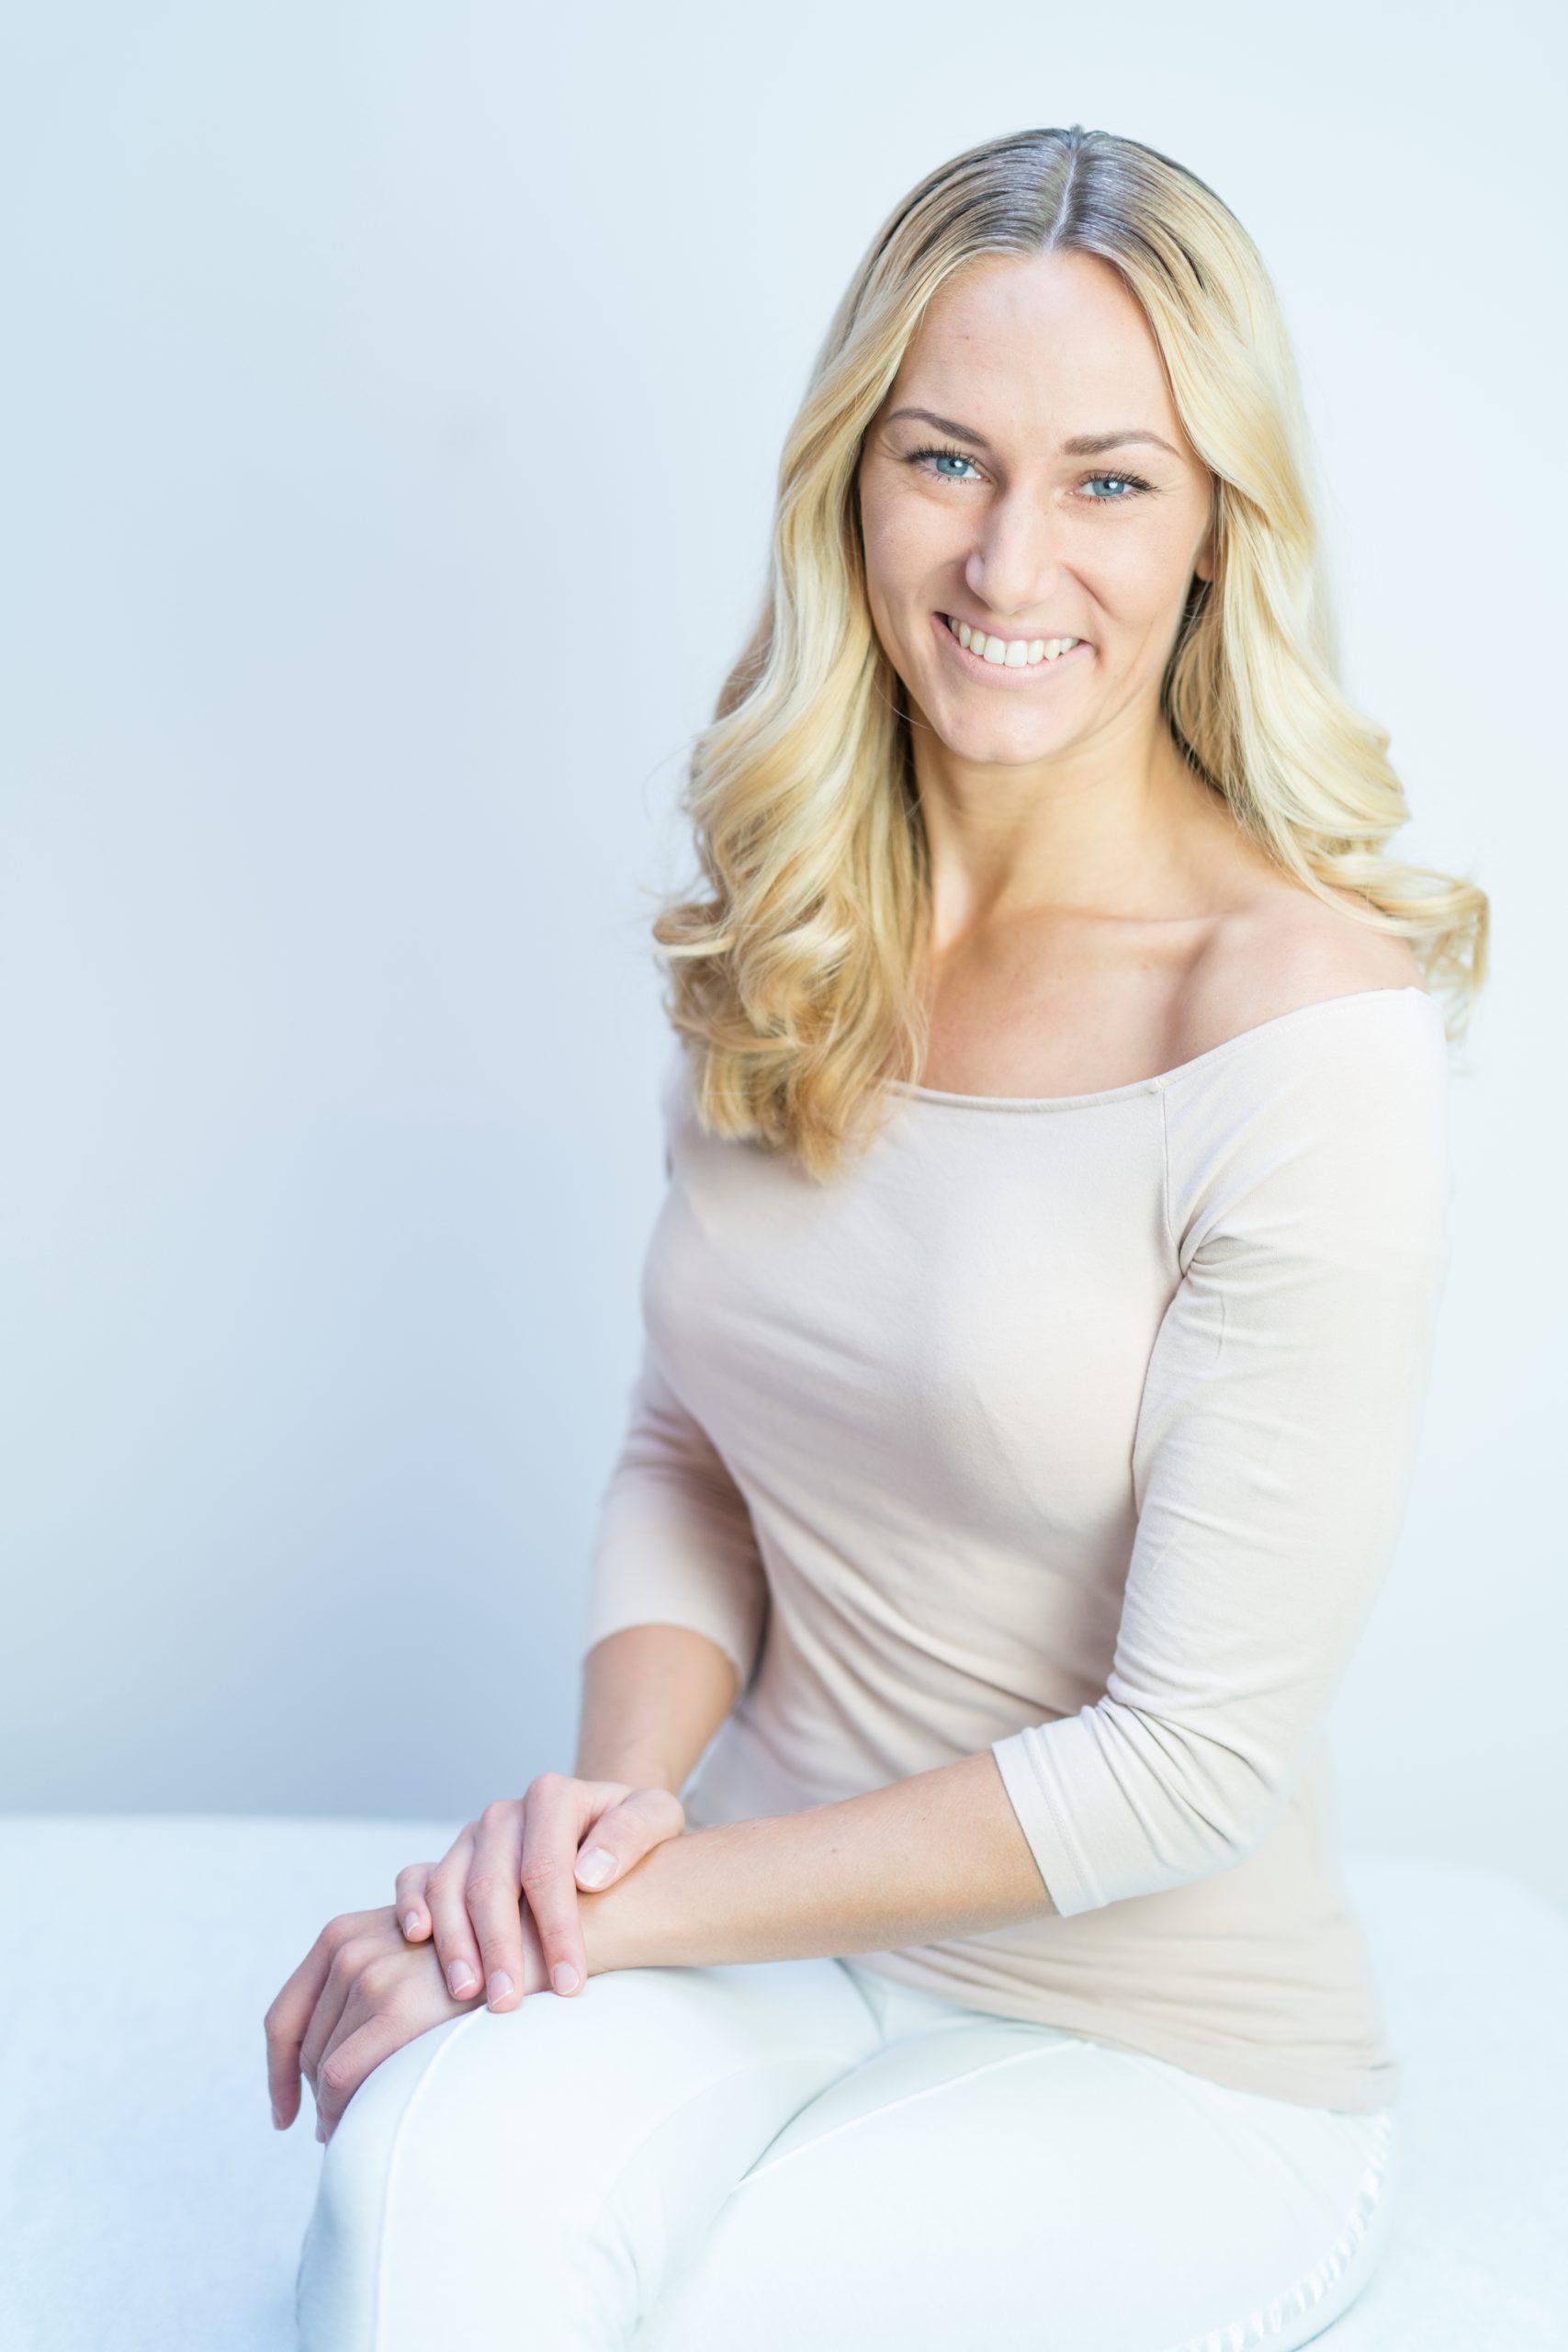 Rayette van Weijen yogadocent masseuse